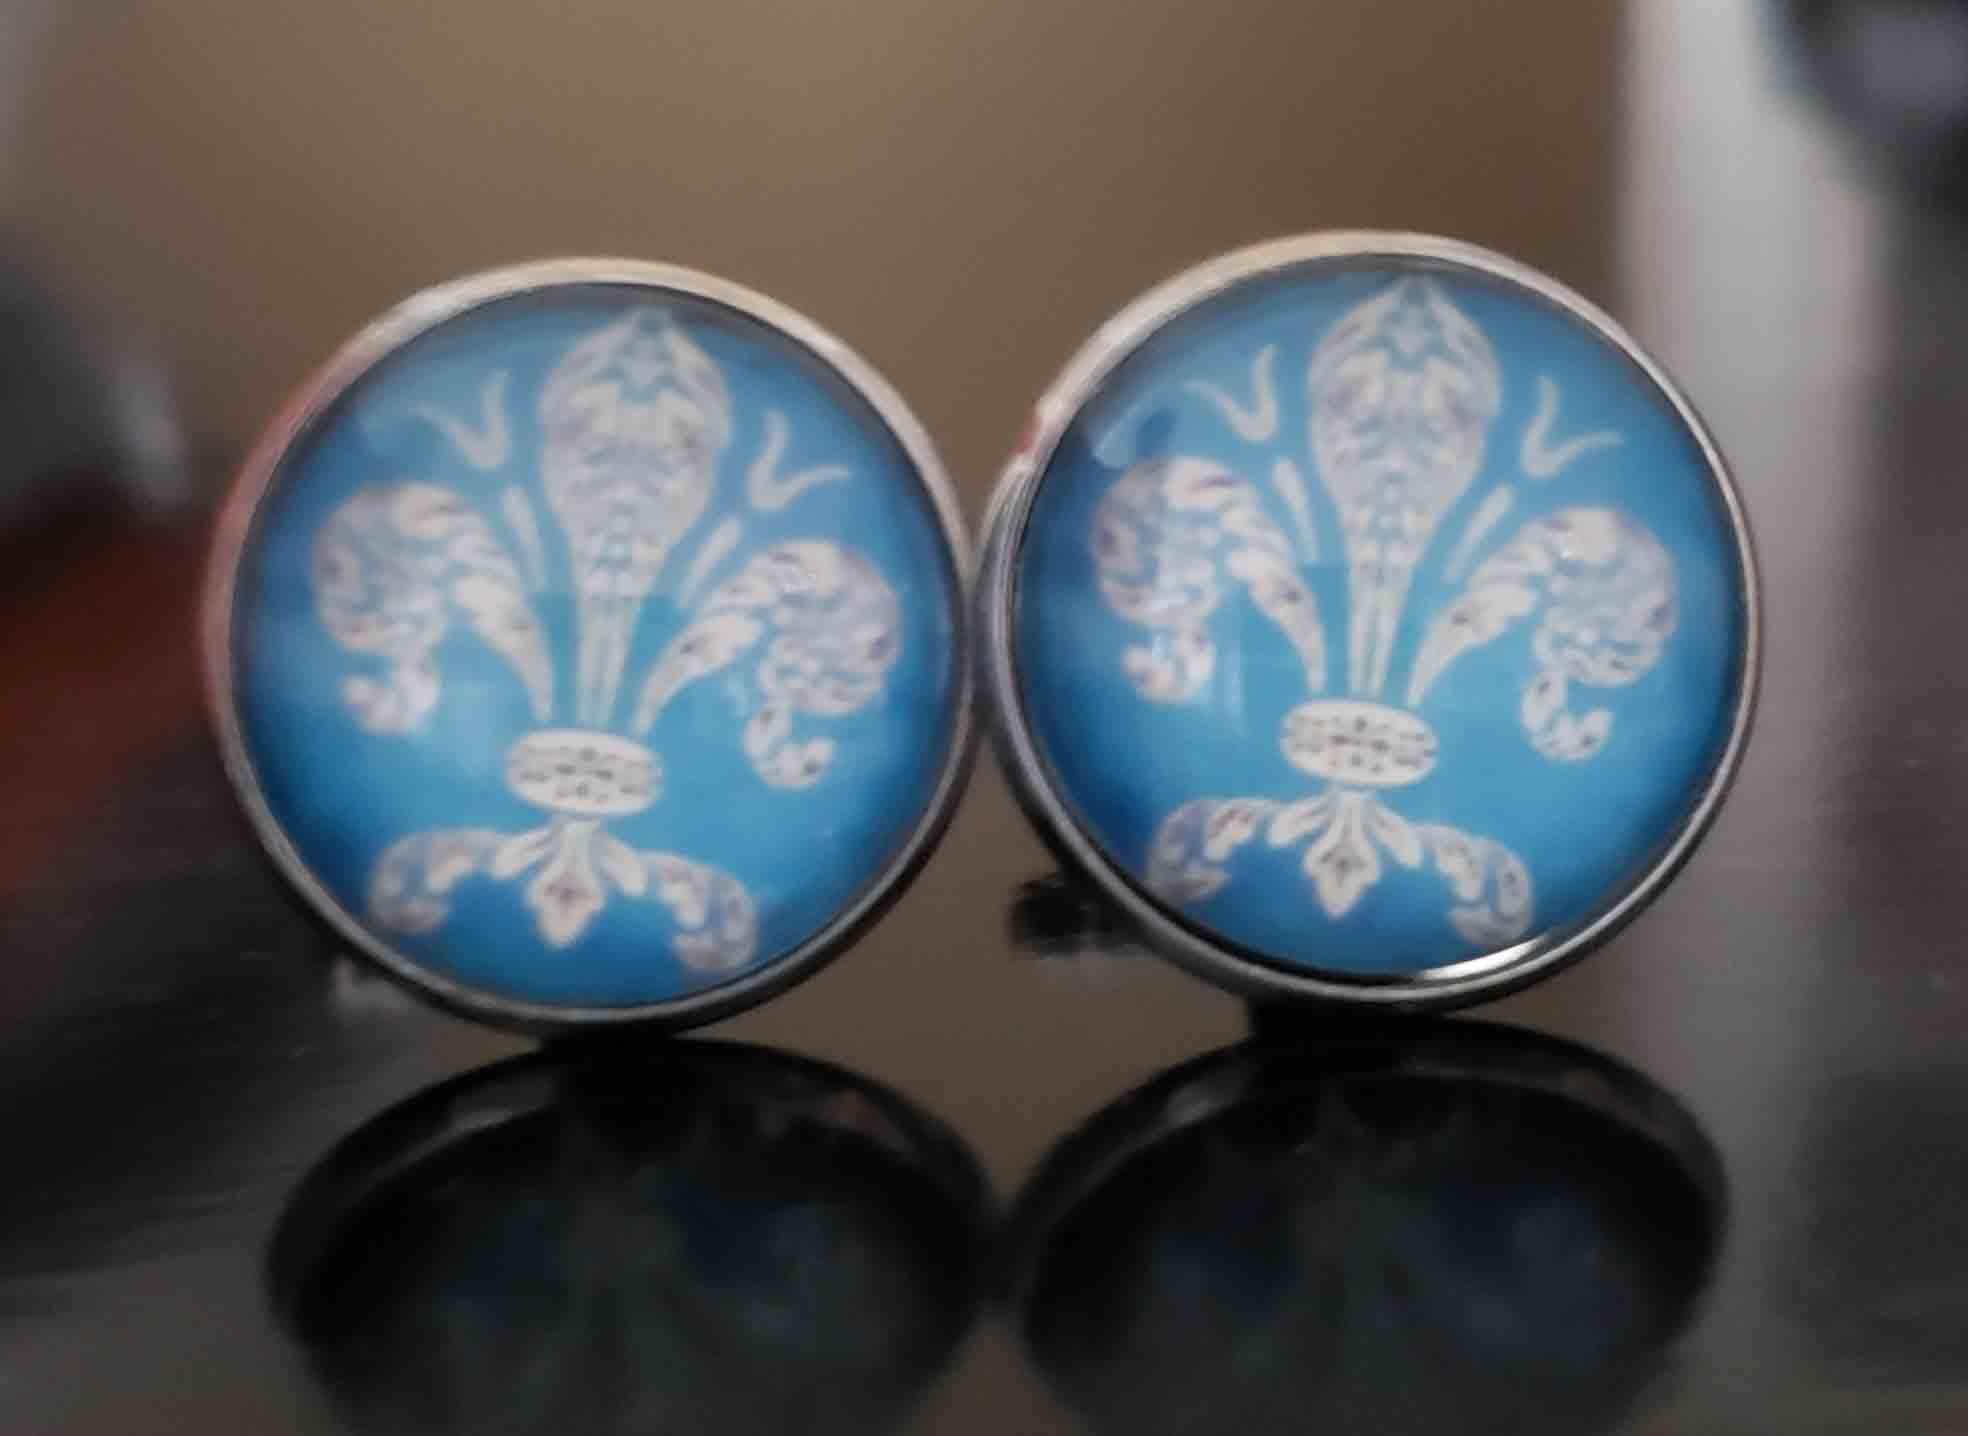 Gascoigne Cufflinks Silver Metal Alloy Blue White Fleur De Lis Pattern Men's